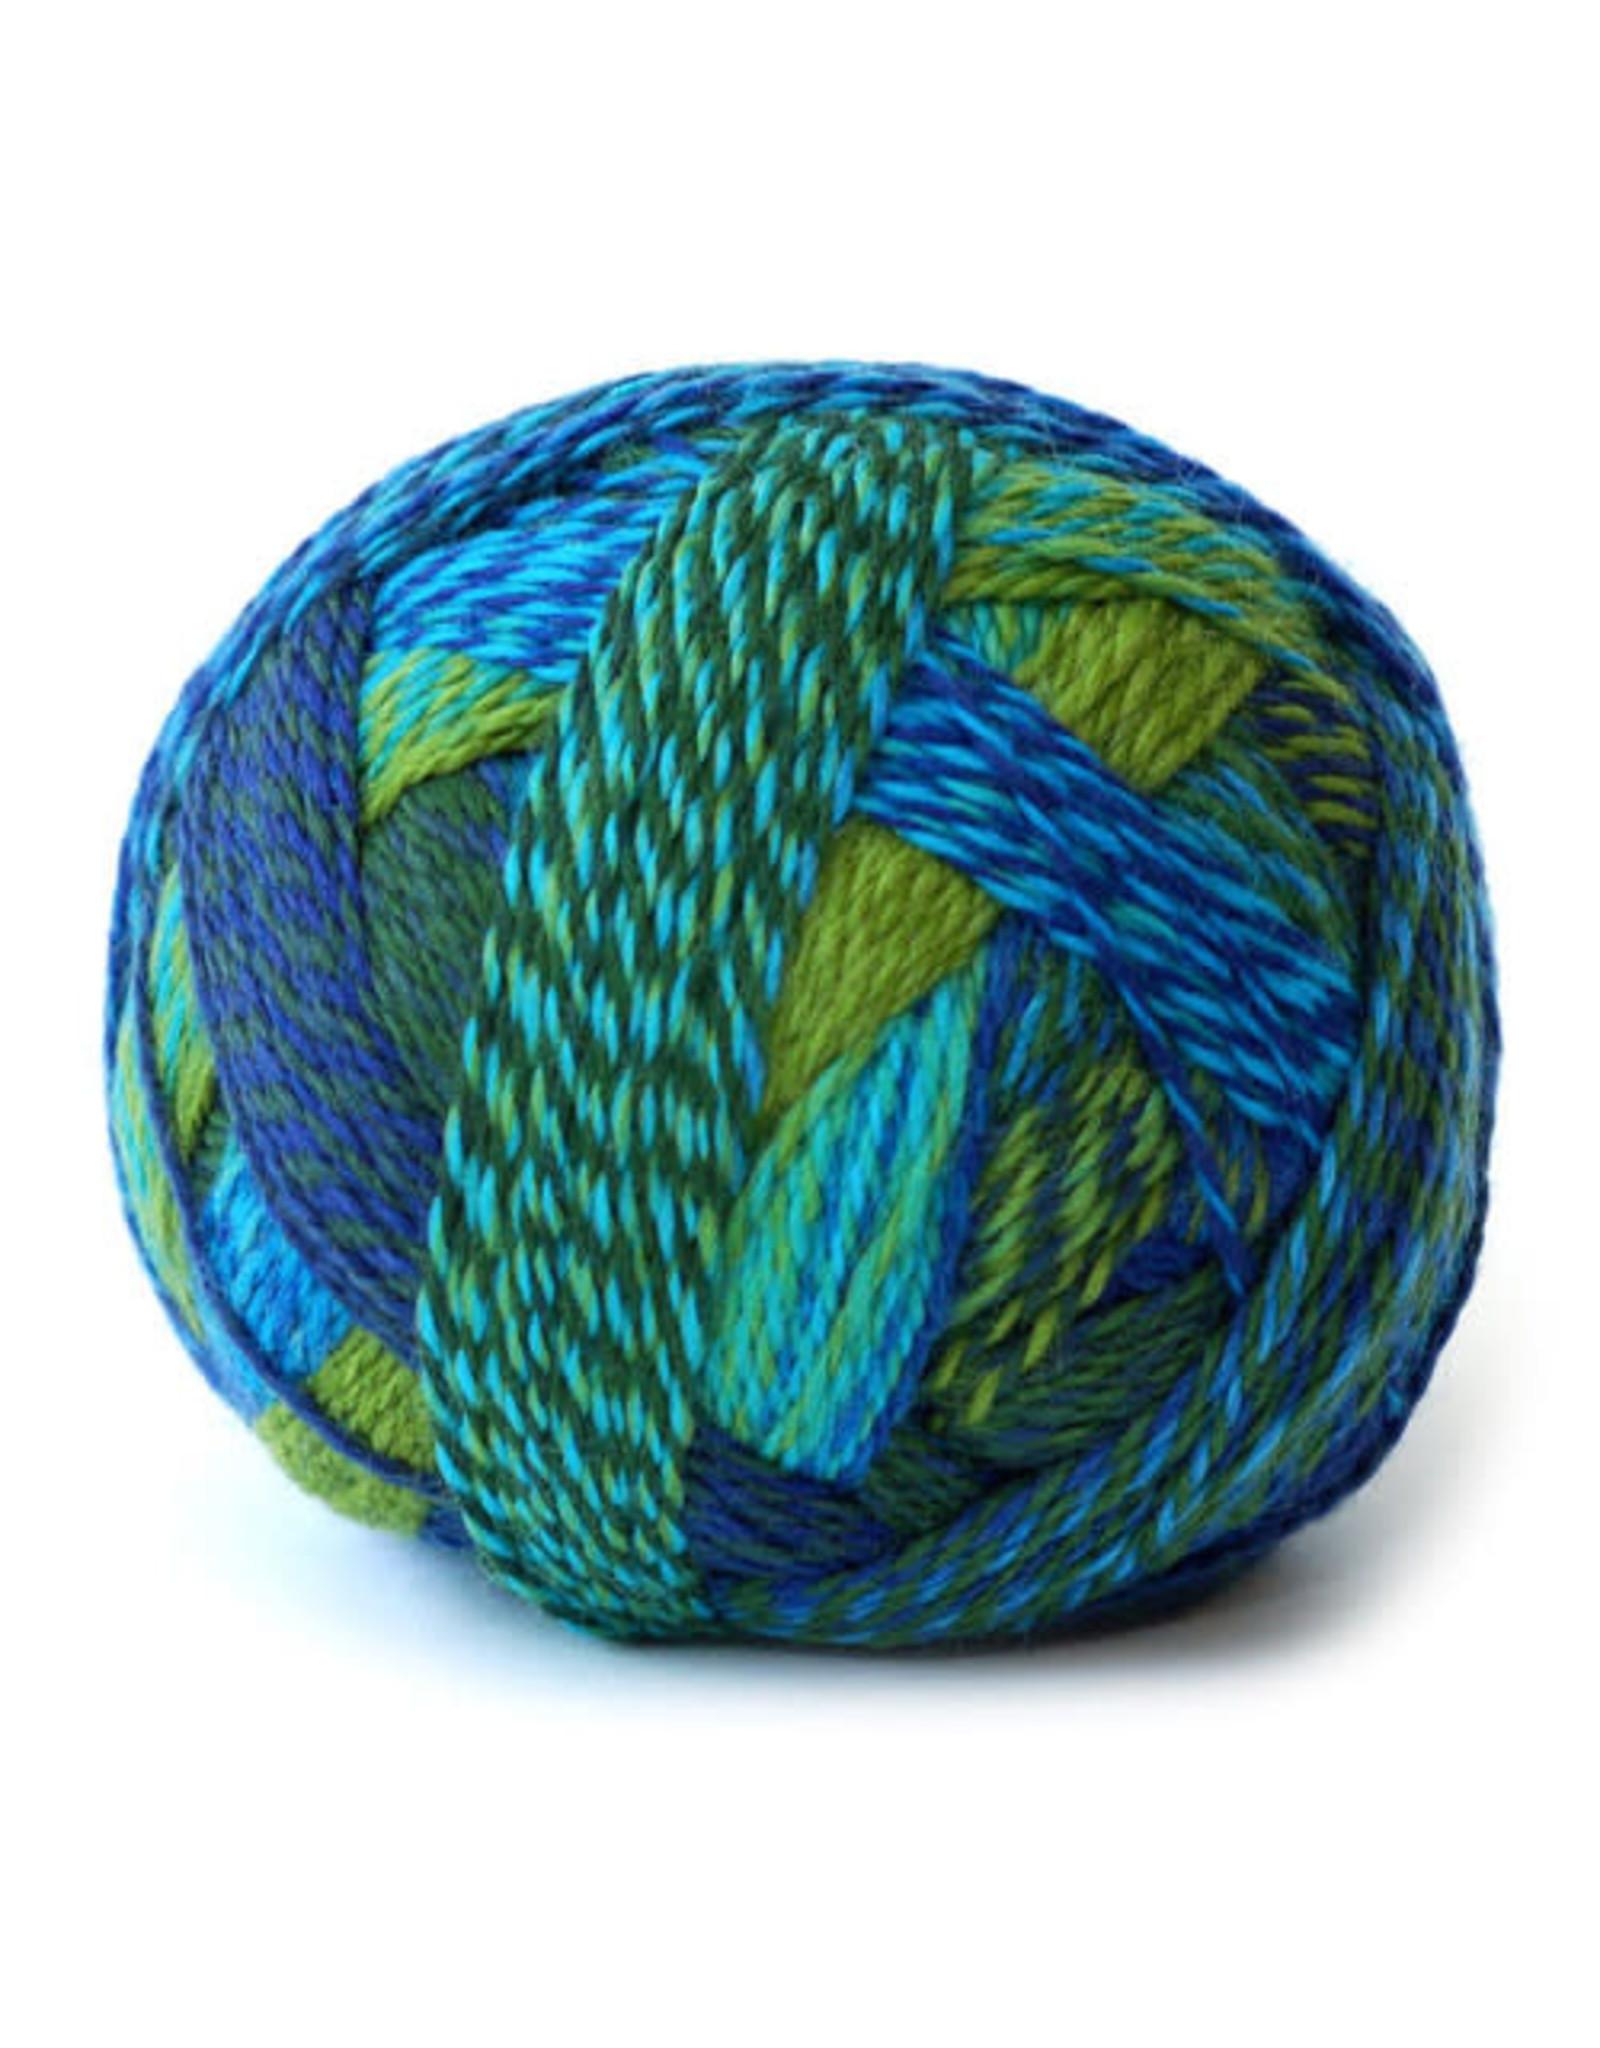 Scoppel-Wolle 2136 - Zauberball Crazy - Schoppel Wolle